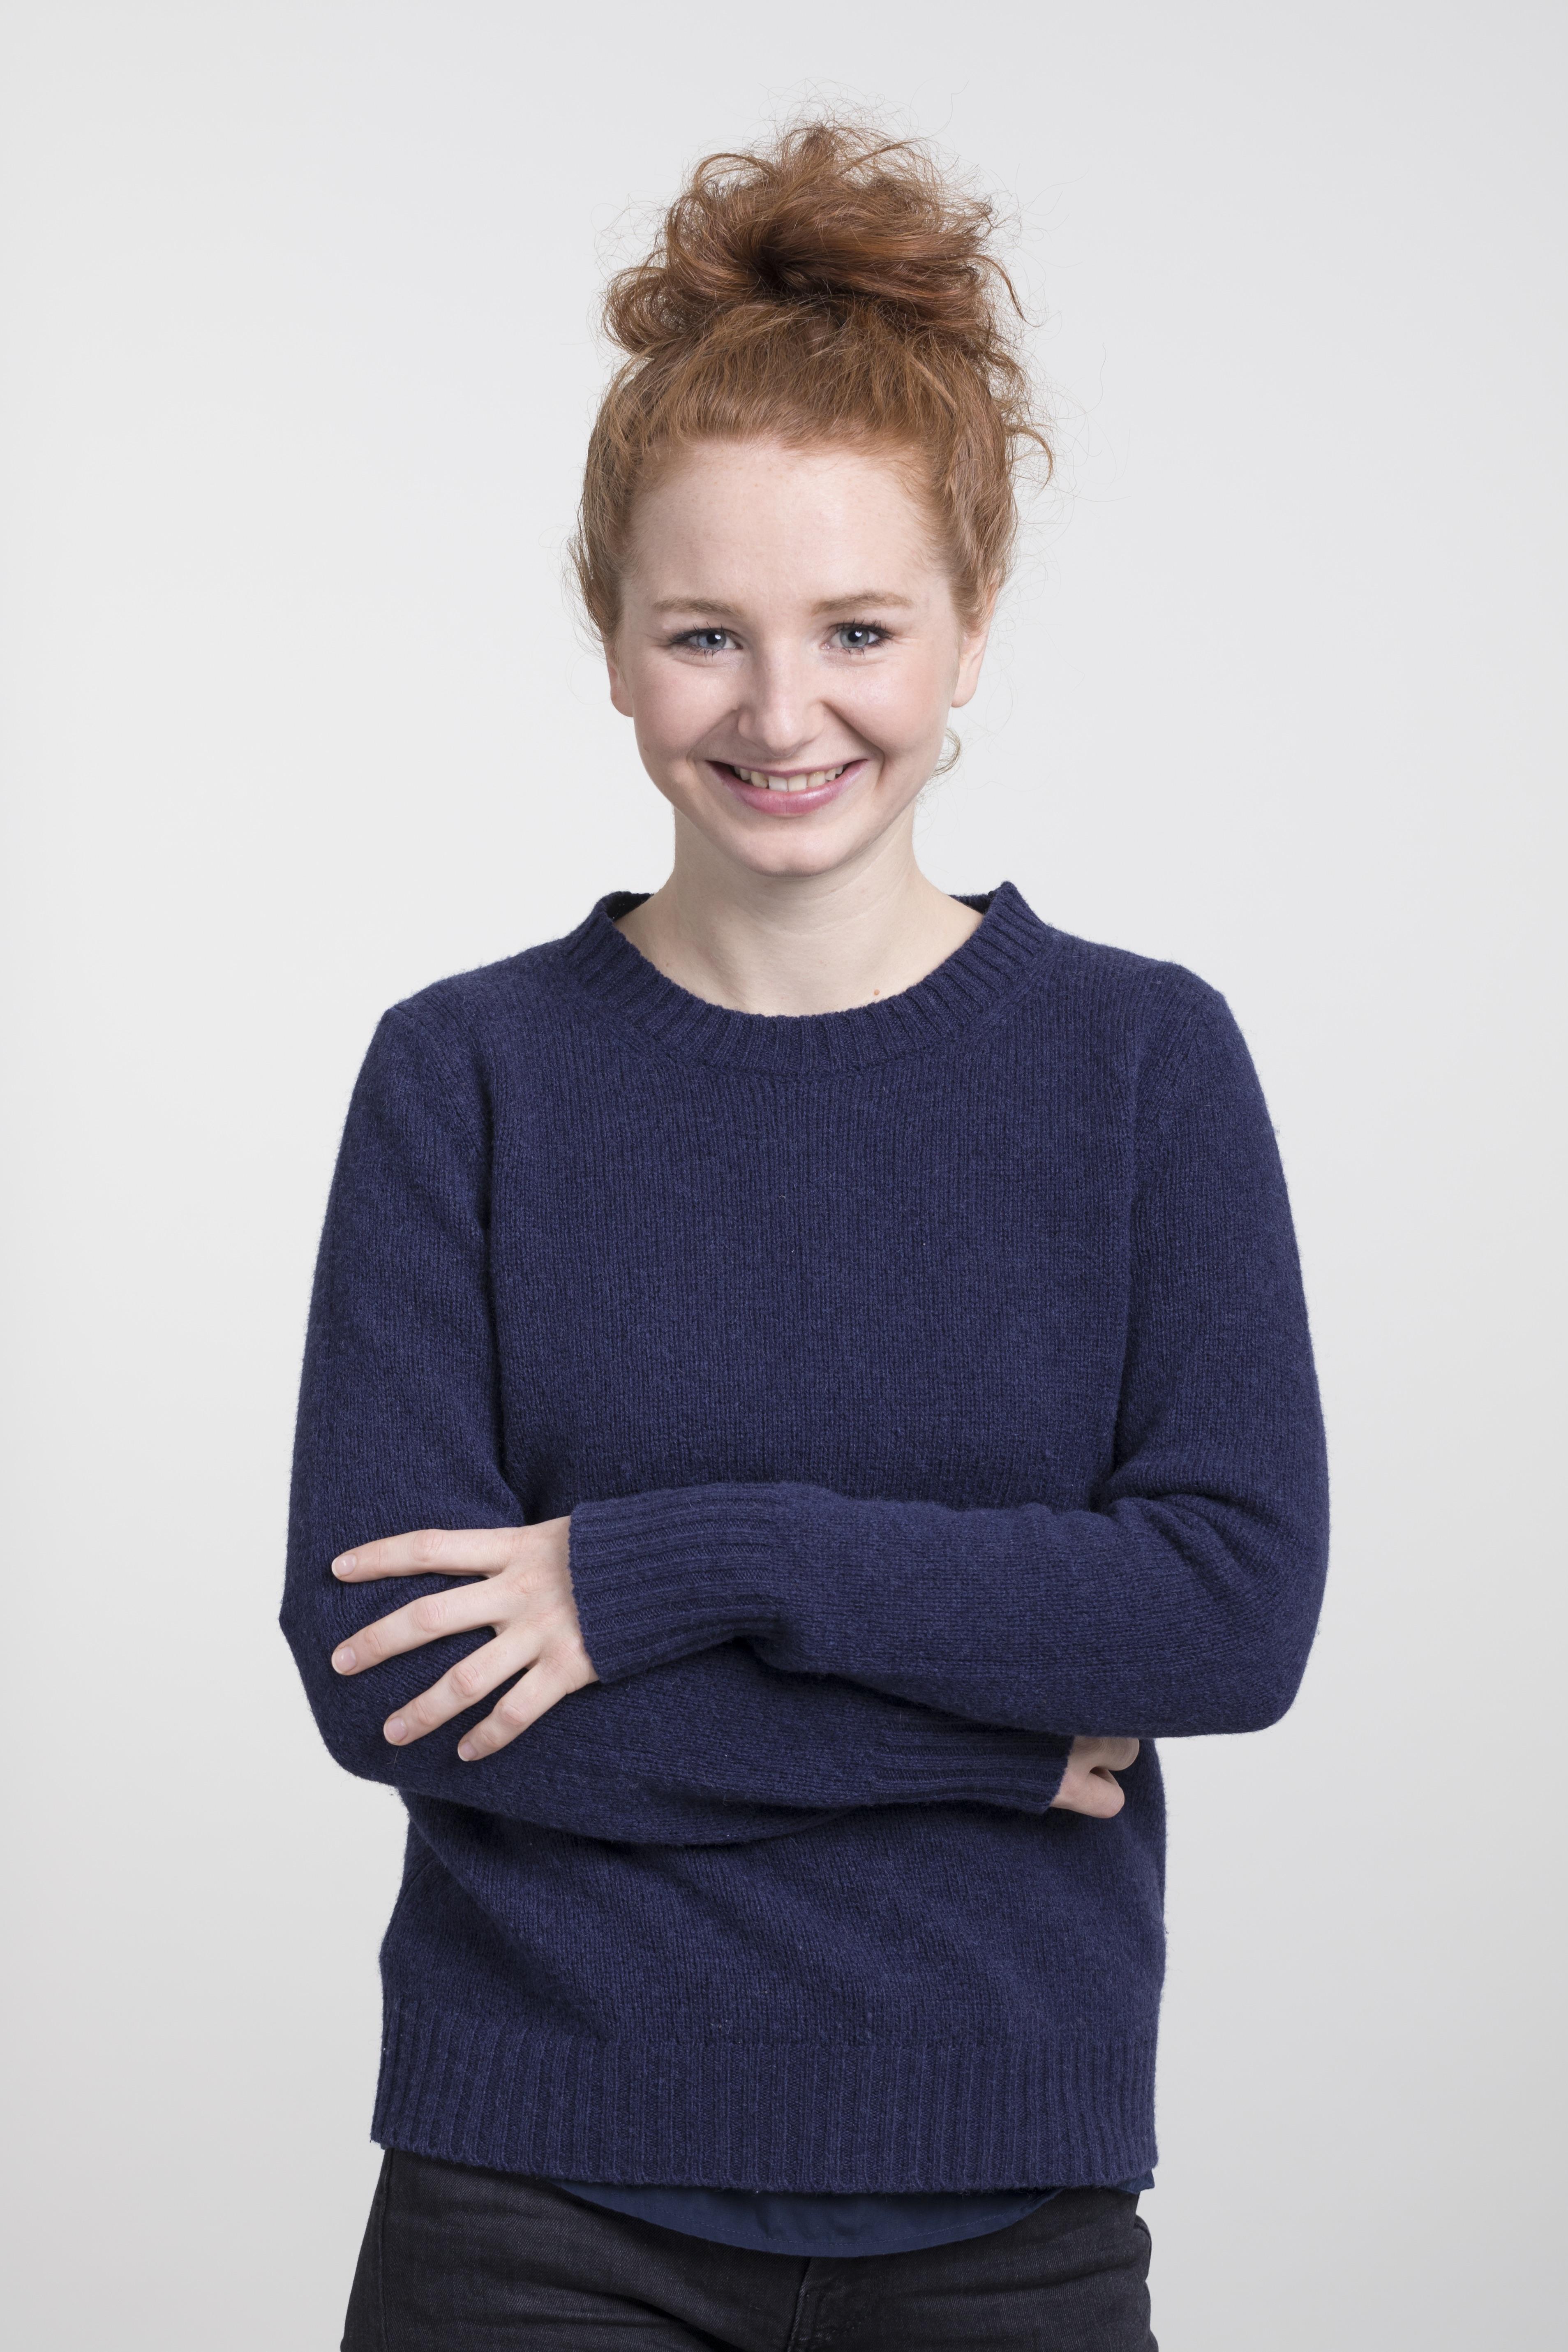 Anna Haberl